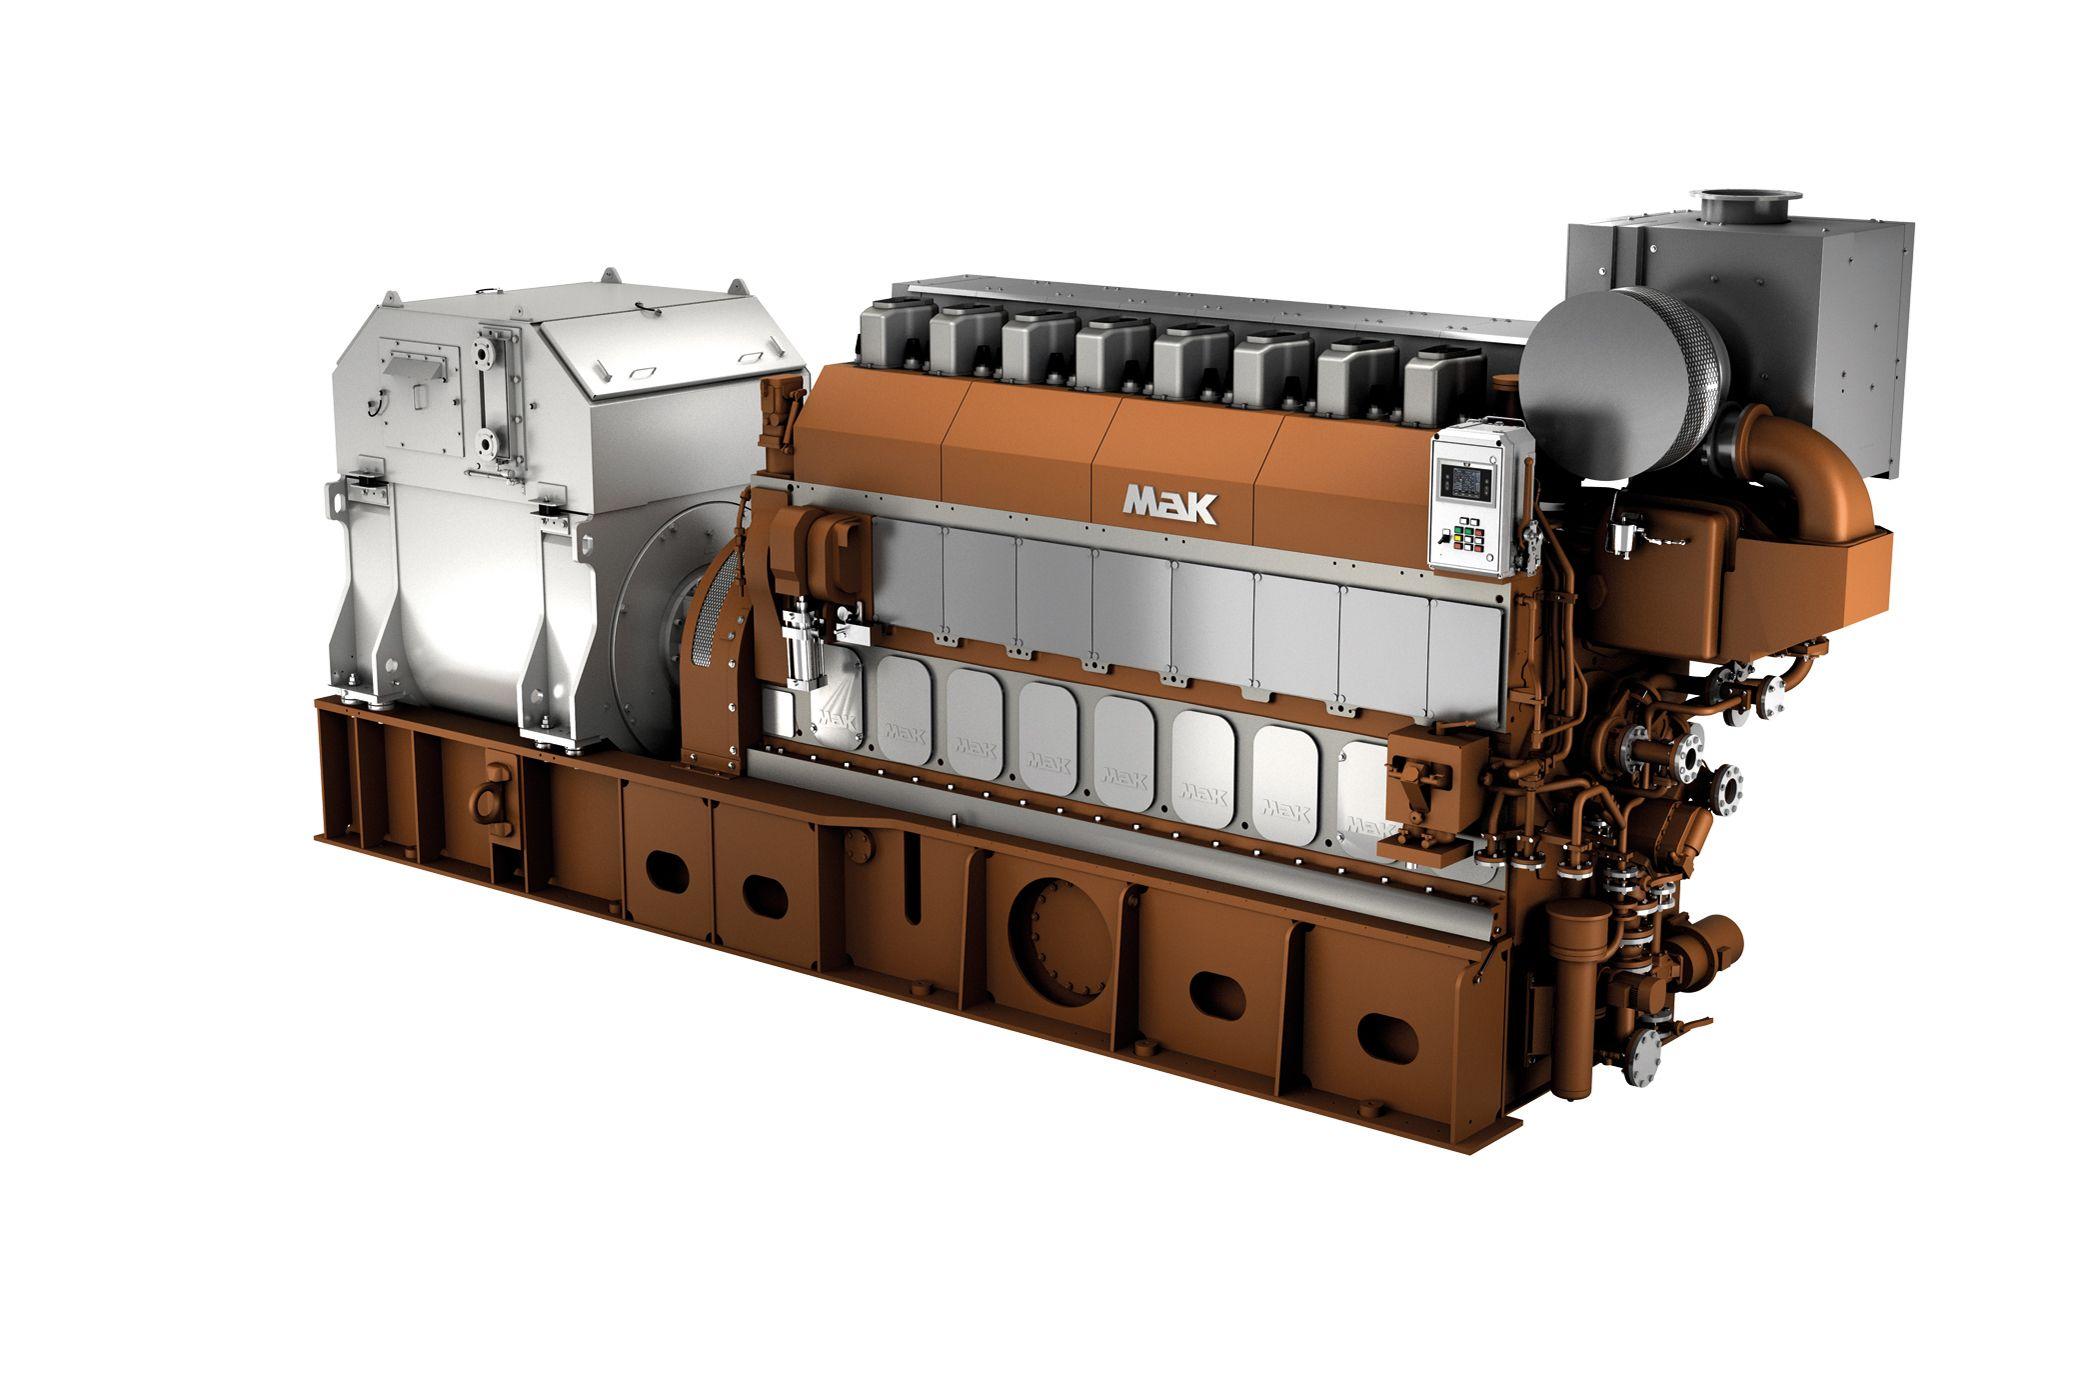 M 25 E Marine Generator Set